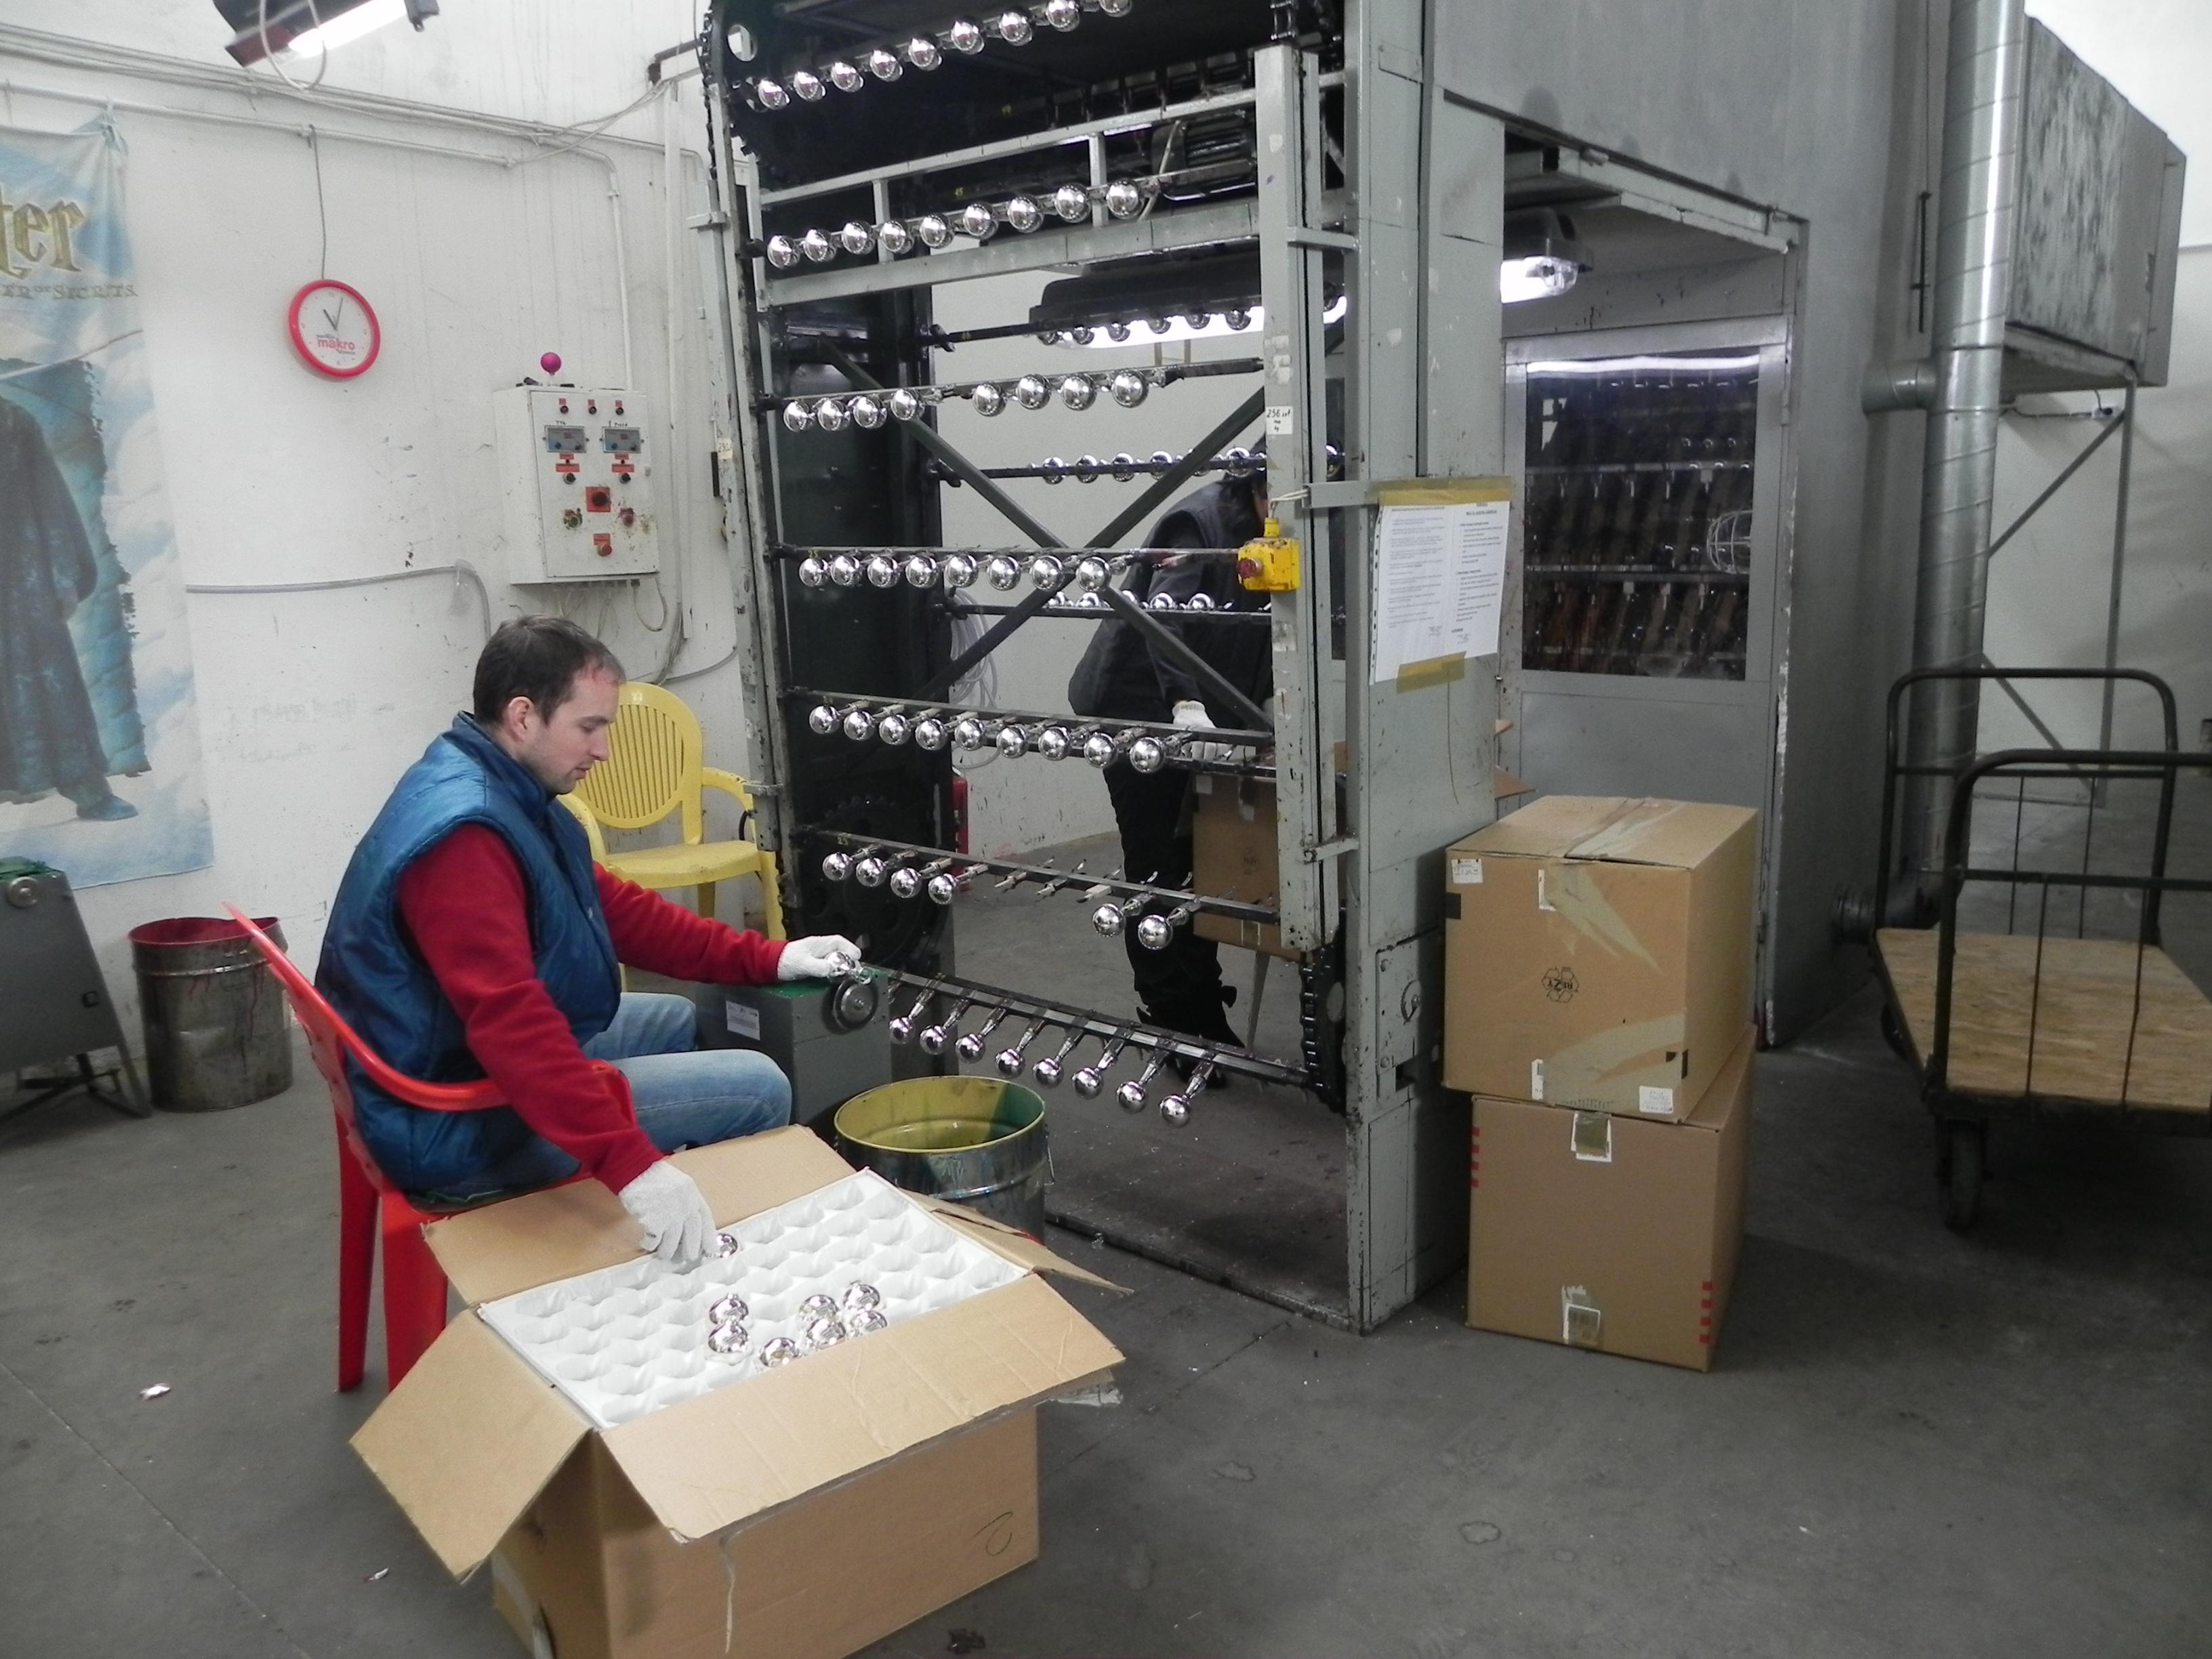 Cabina di verniciatura mar udm macchinari usati exapro for Affitti di cabina iowa lansing ia